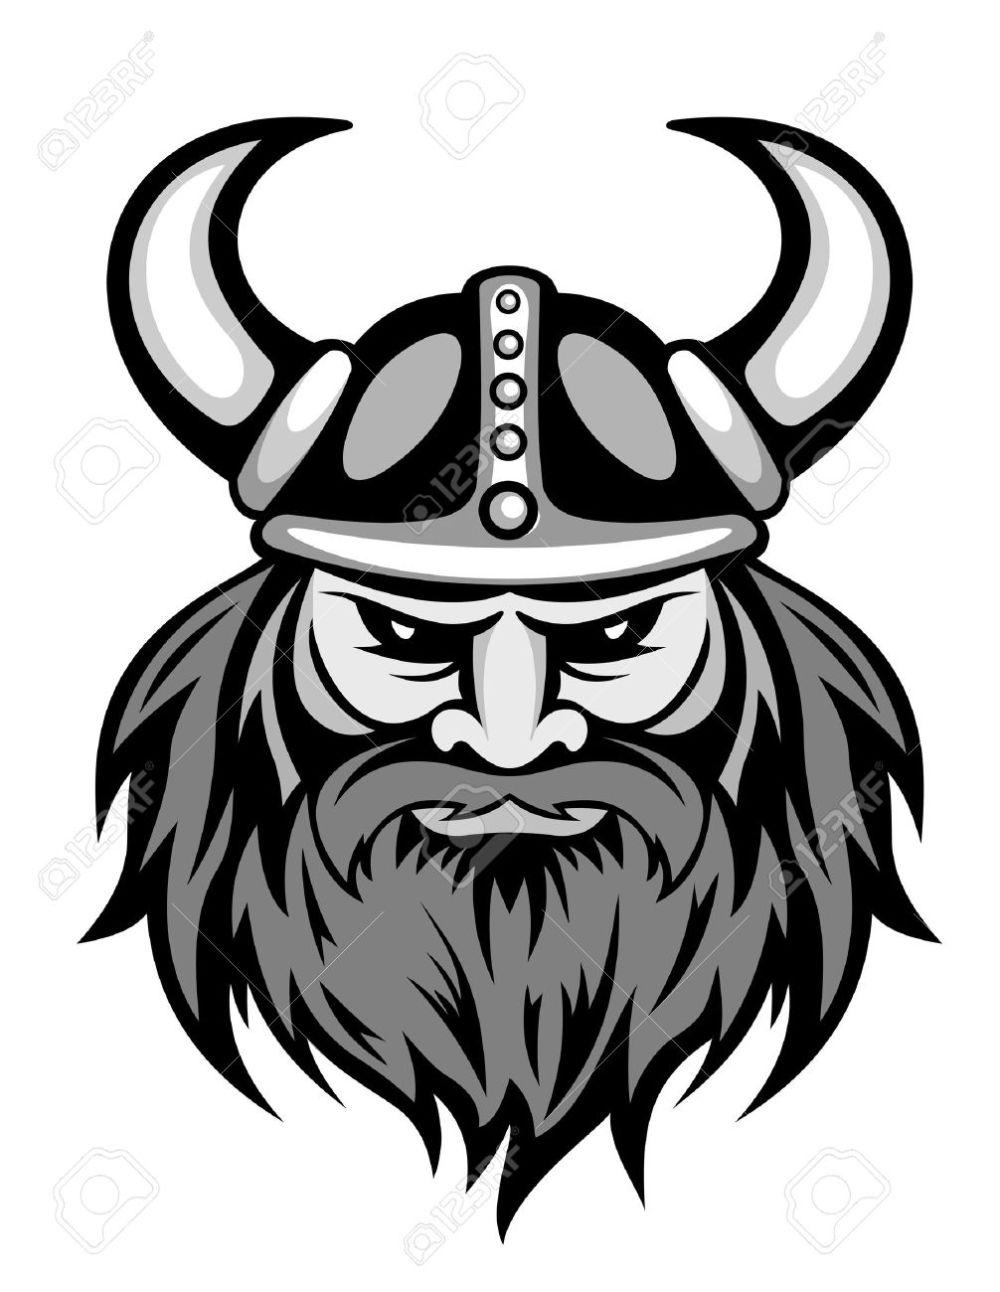 medium resolution of 1006x1300 viking clipart black and white